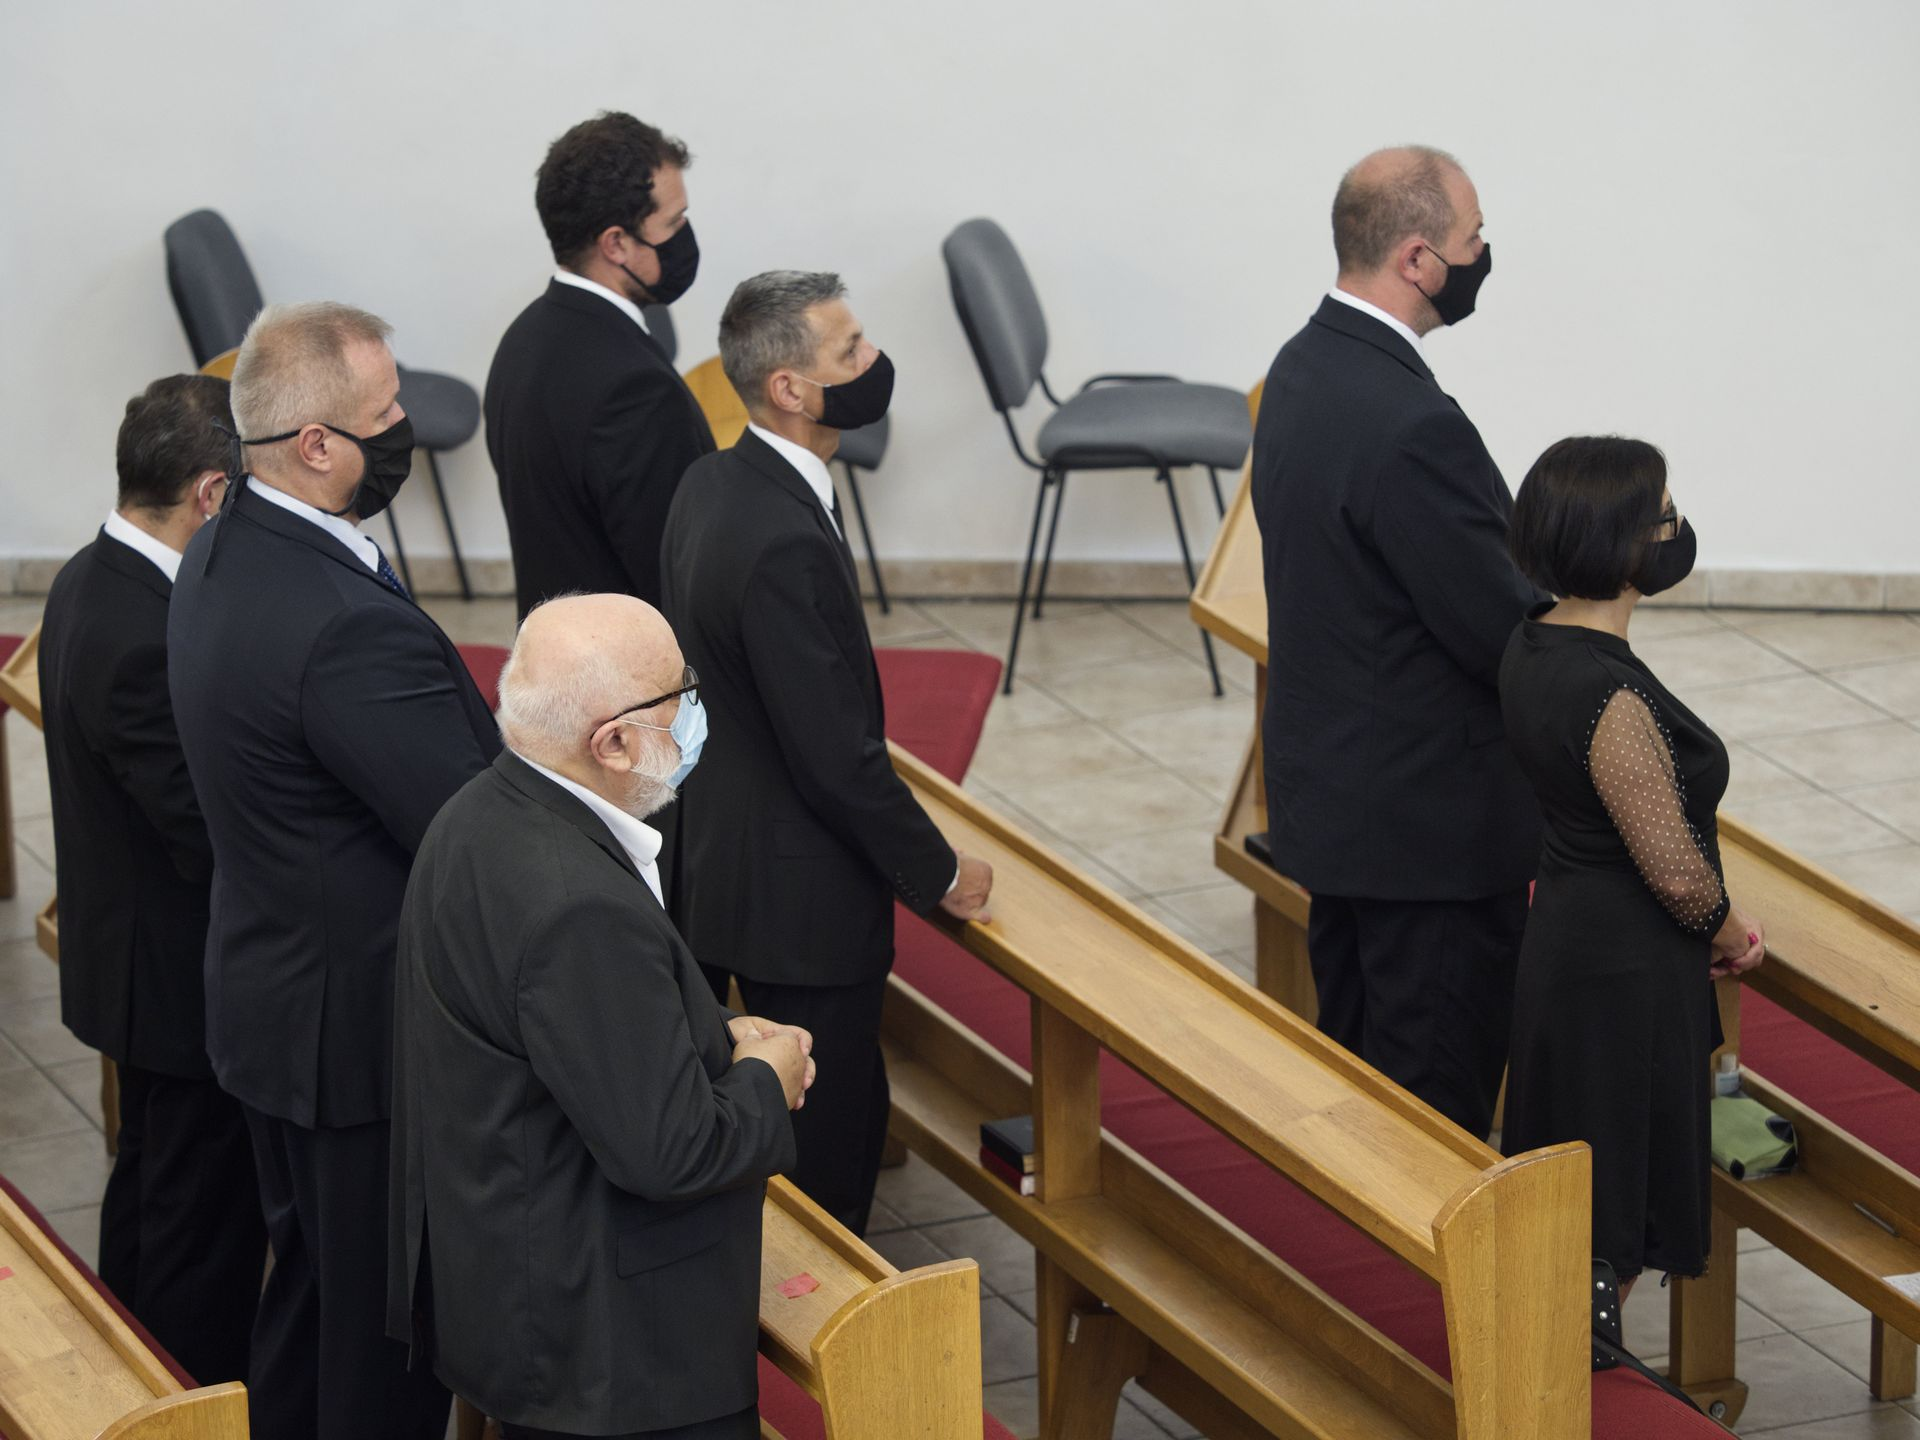 PohrebMikulasCecko21